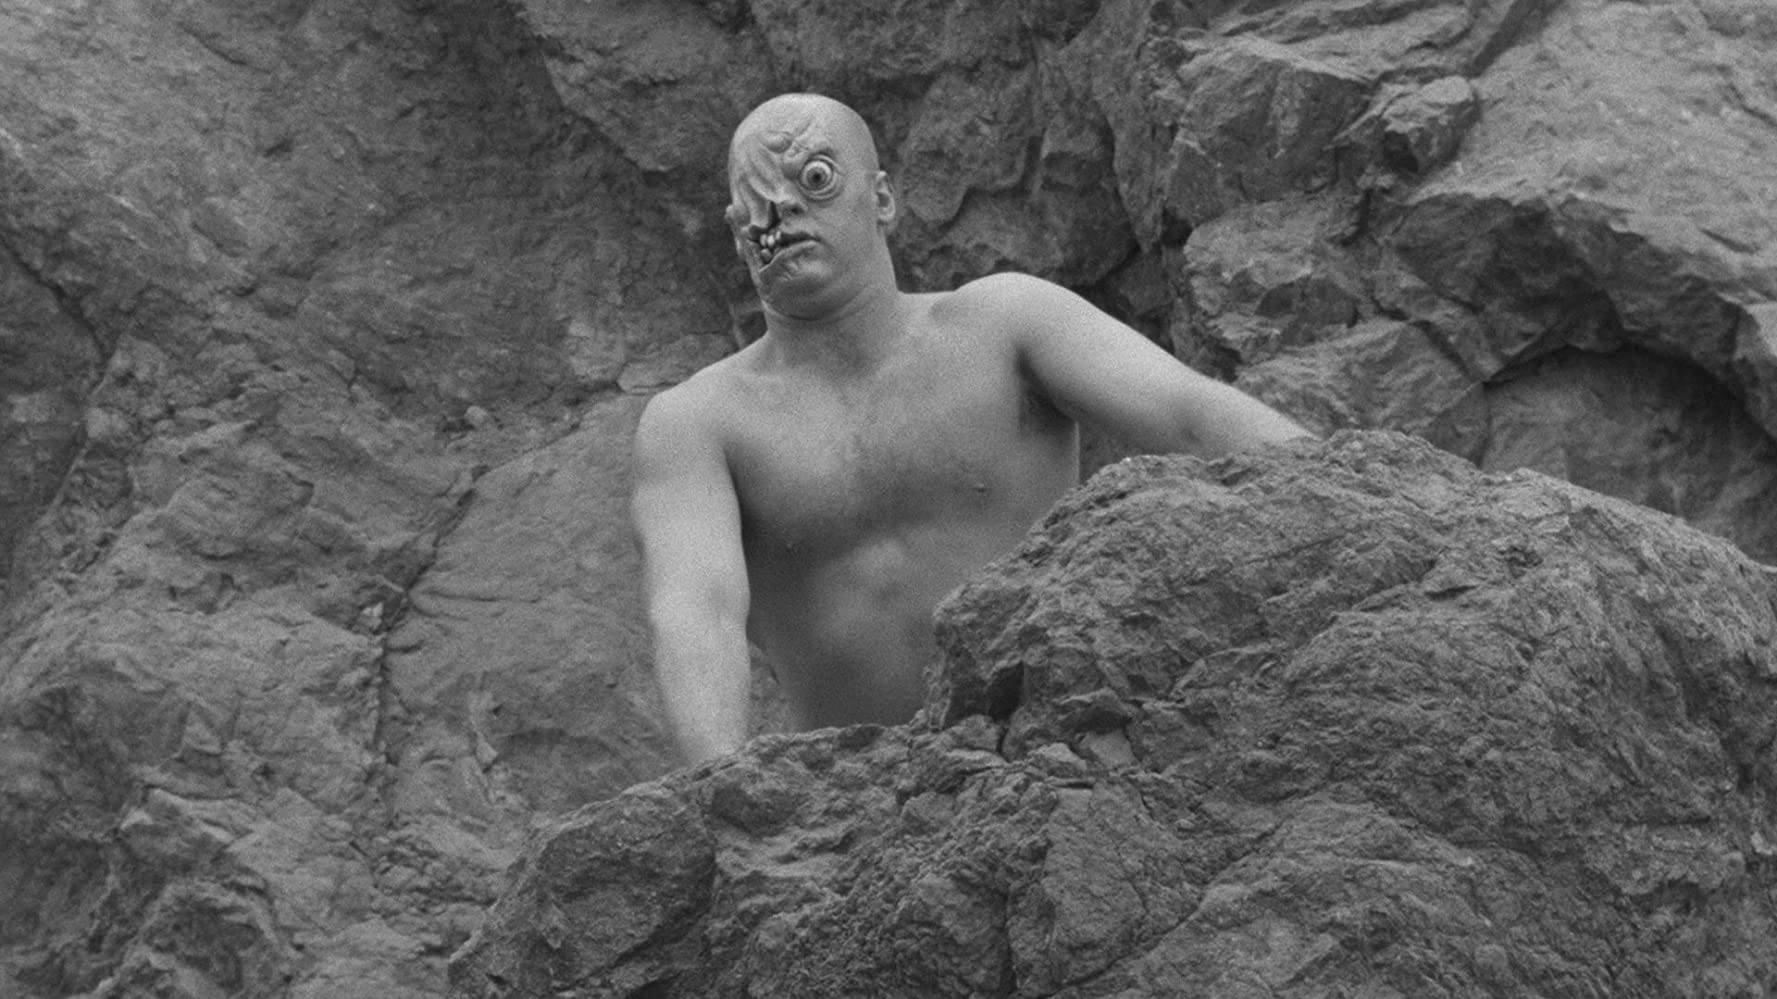 Duncan Parkin as The Cyclops (1957)